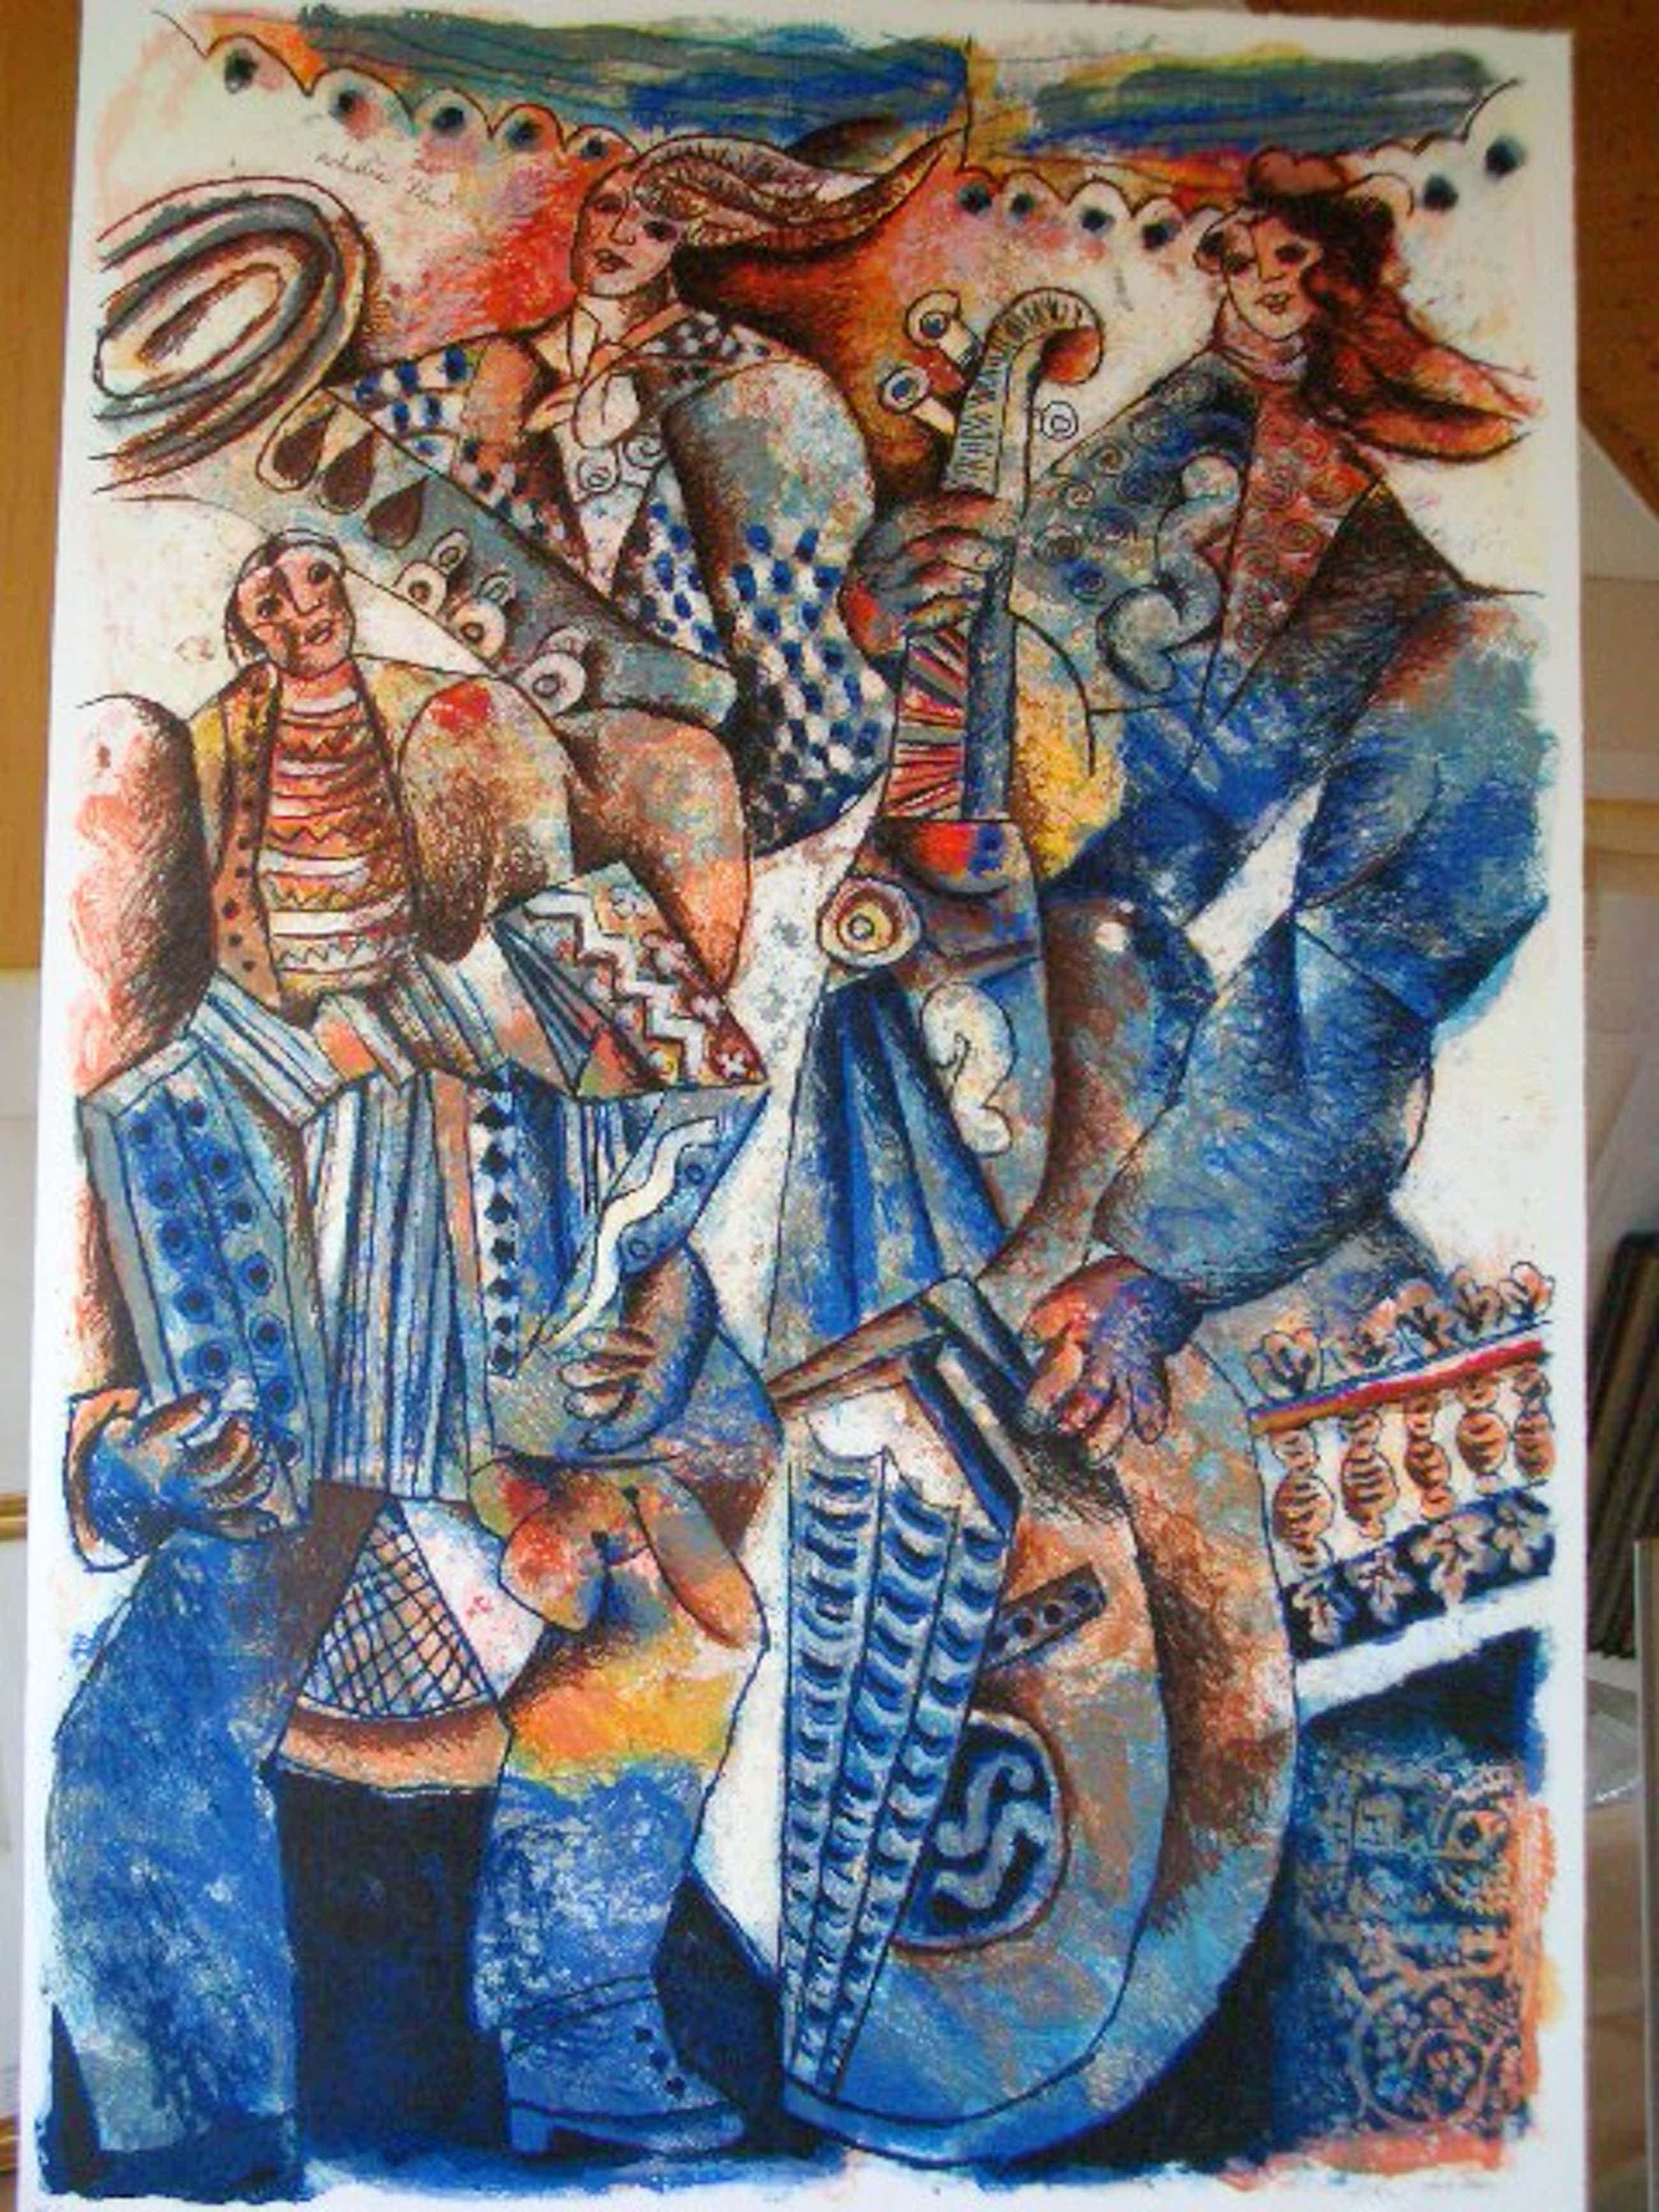 Theo Tobiasse - Orchestre Bleu. Lithografie kopen? Bied vanaf 430!